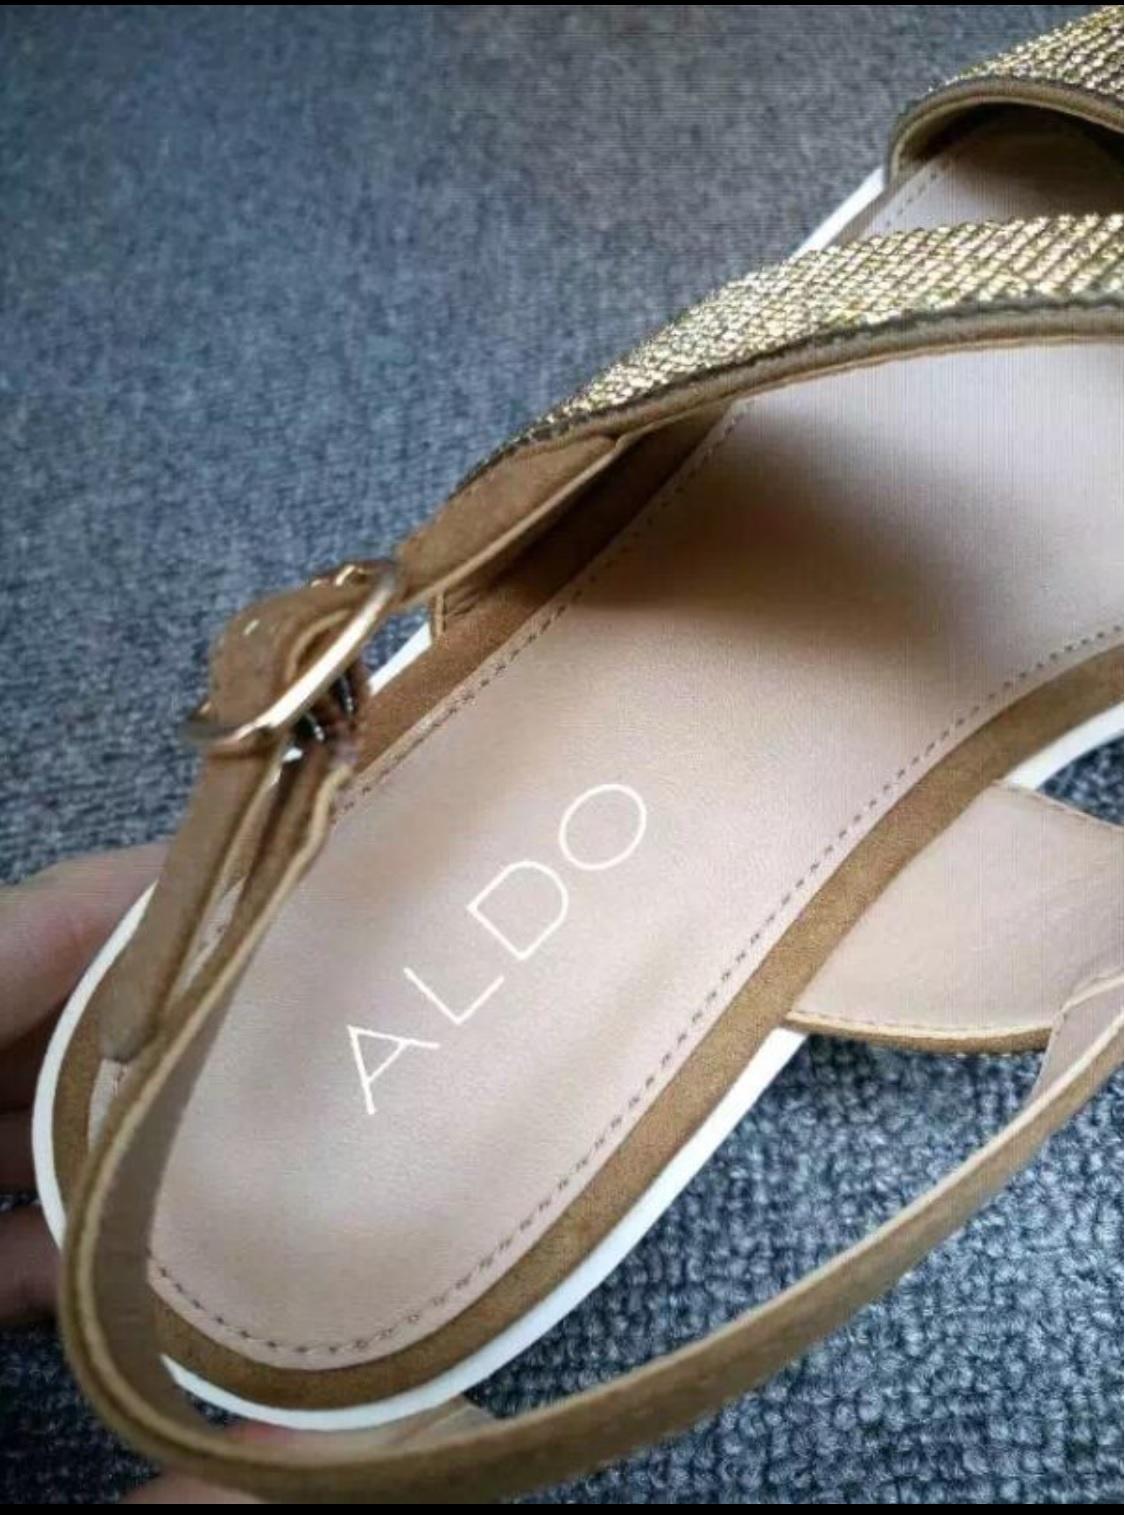 08c1c3b55 SALE - ALDO Eowenna Rhinestone covered Leather Sandals ...